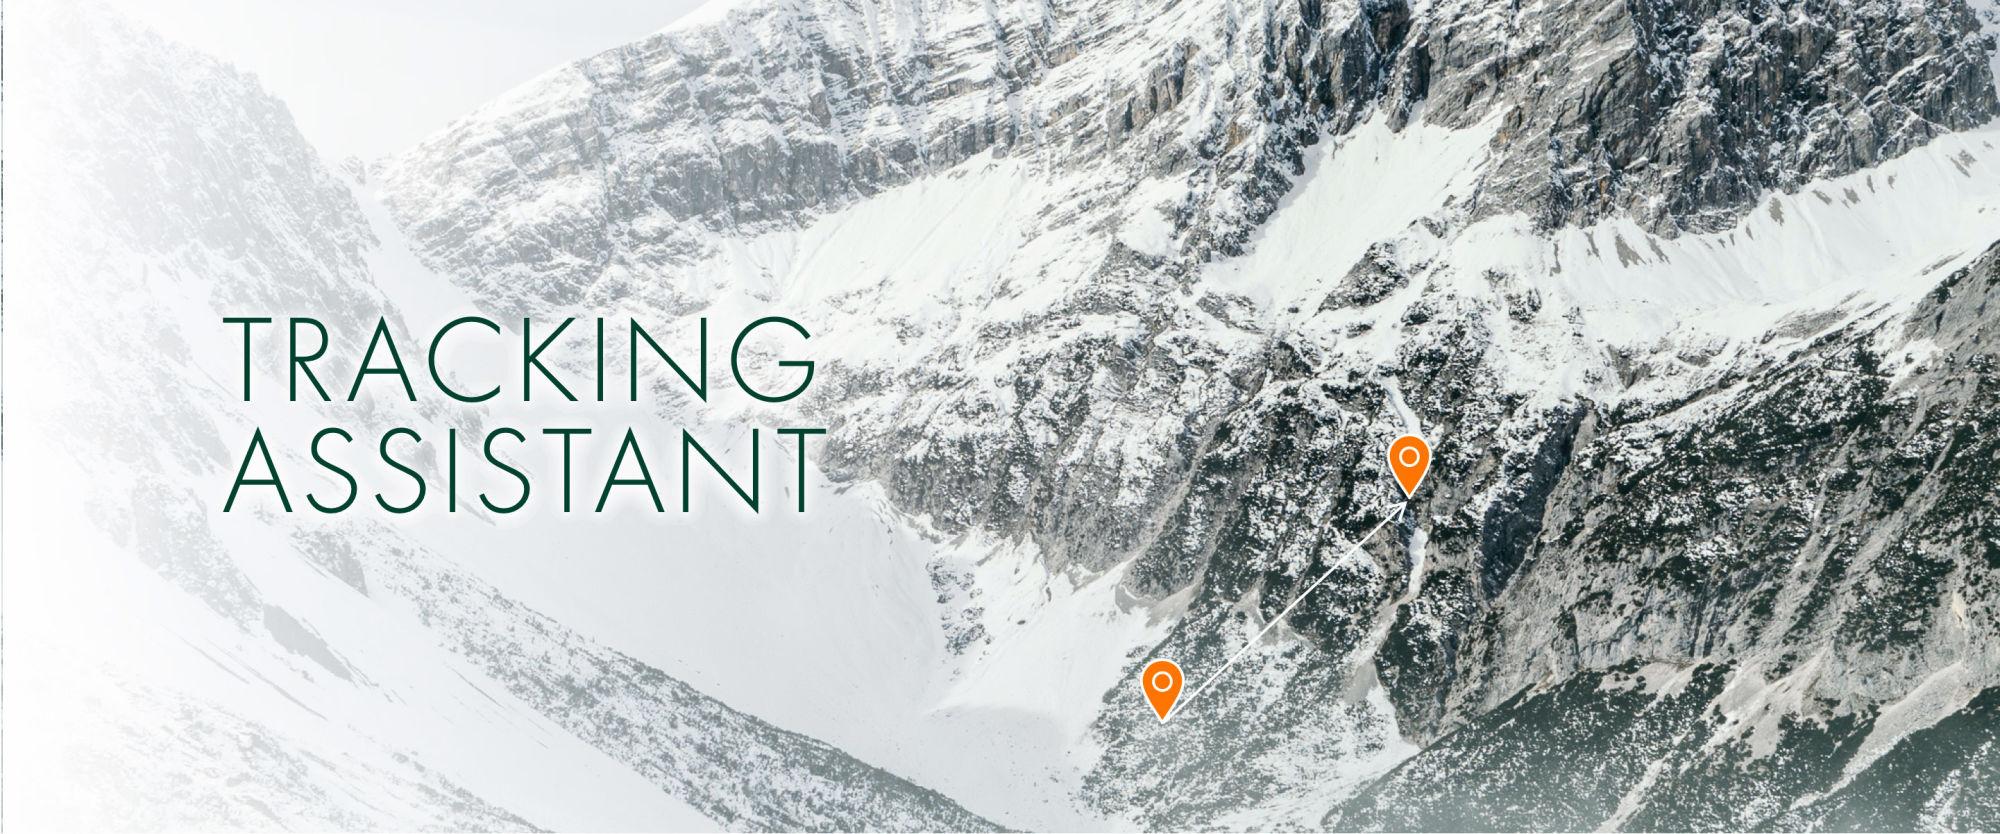 EL Range TA Tracking Assistant Sujet, Halltal with Headline